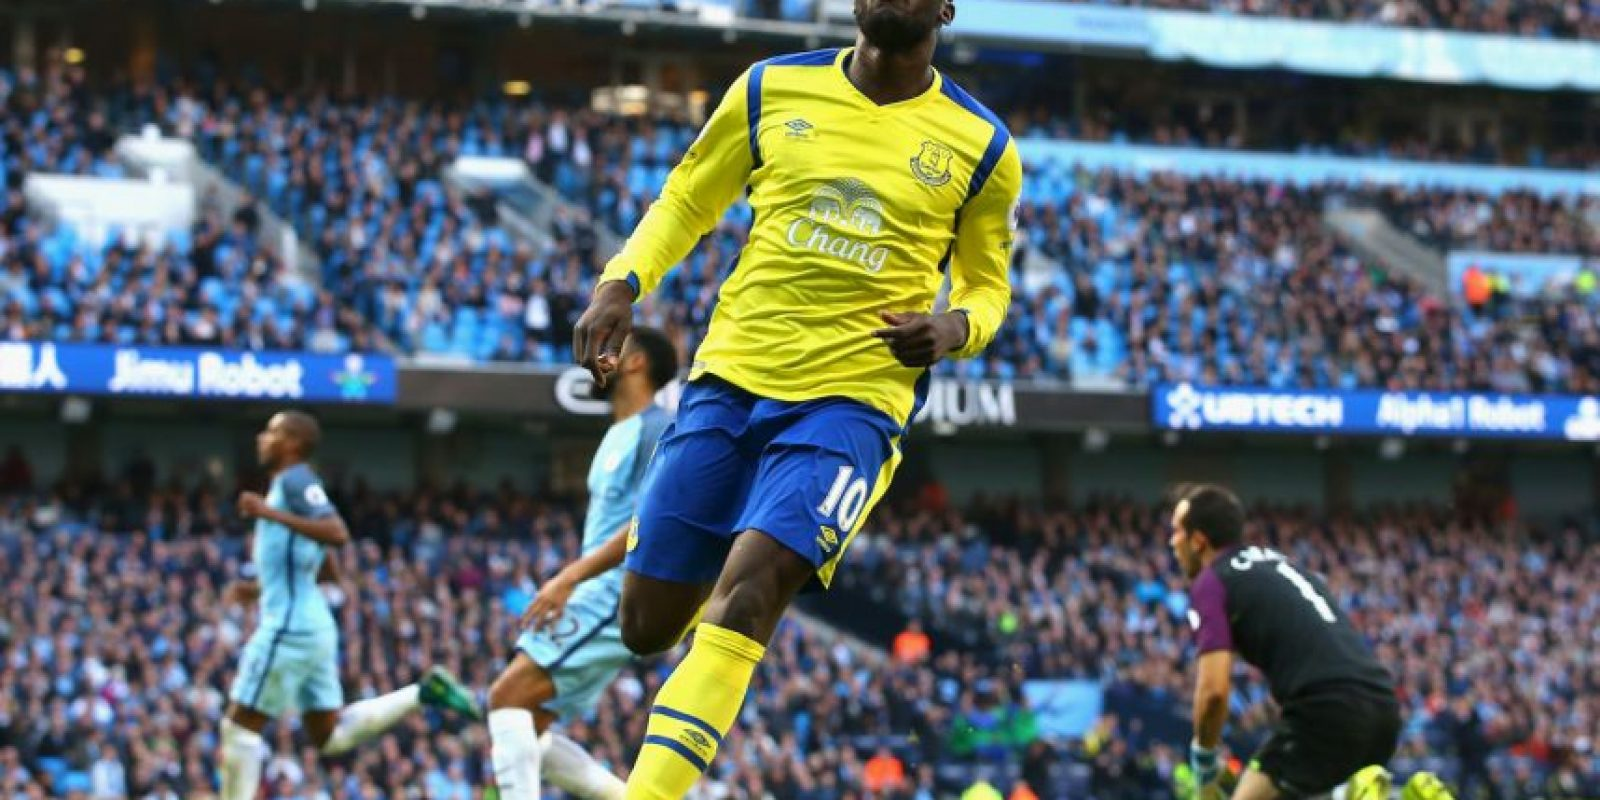 Tras caer con Tottenham, los Citizens igualaron a un tanto con Everton. Foto:Getty Images